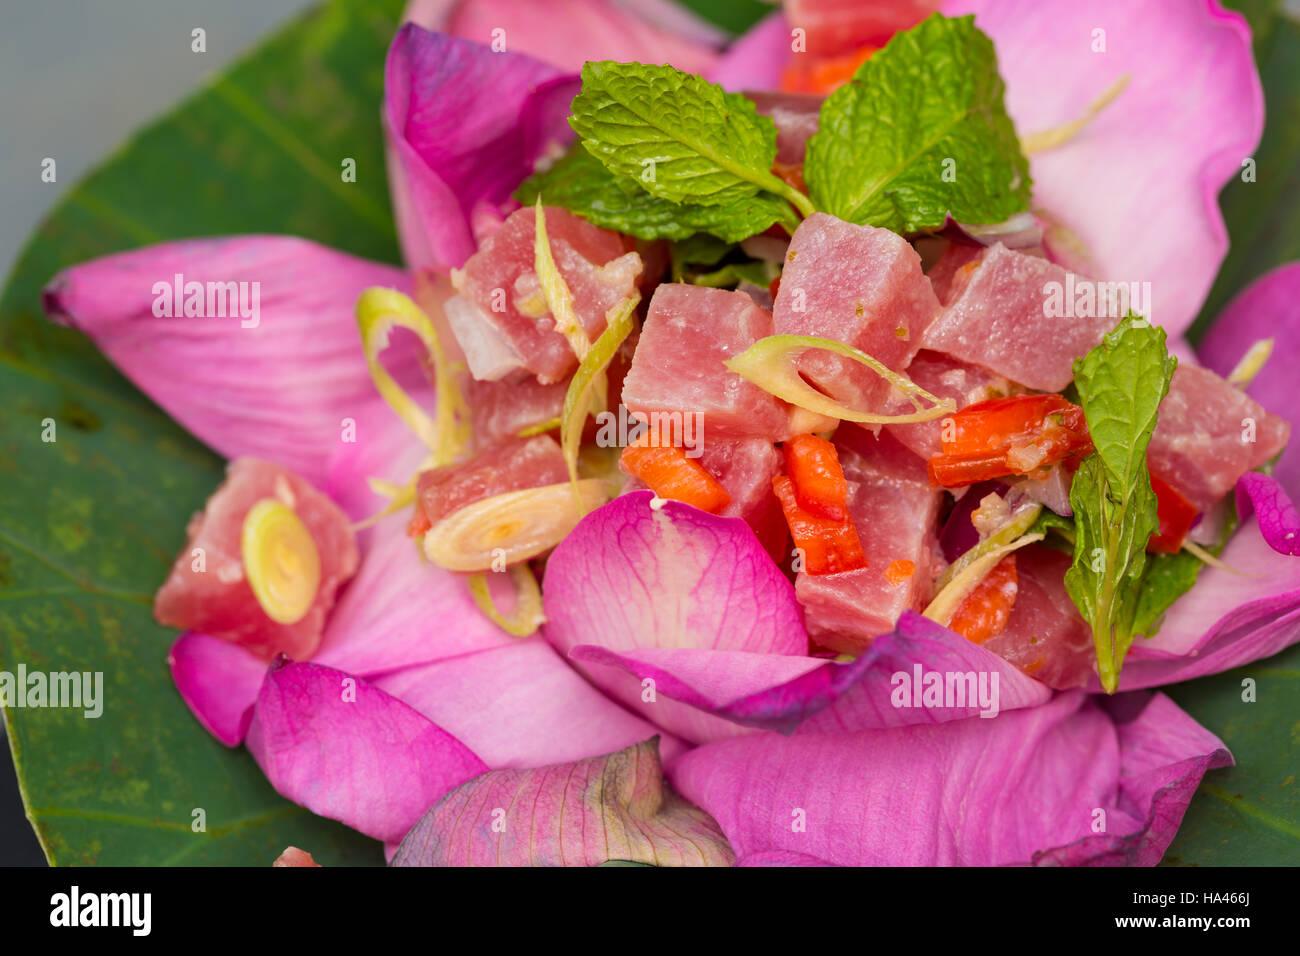 Thai ahi tuna salad served in a beautiful lotus flower stock photo thai ahi tuna salad served in a beautiful lotus flower izmirmasajfo